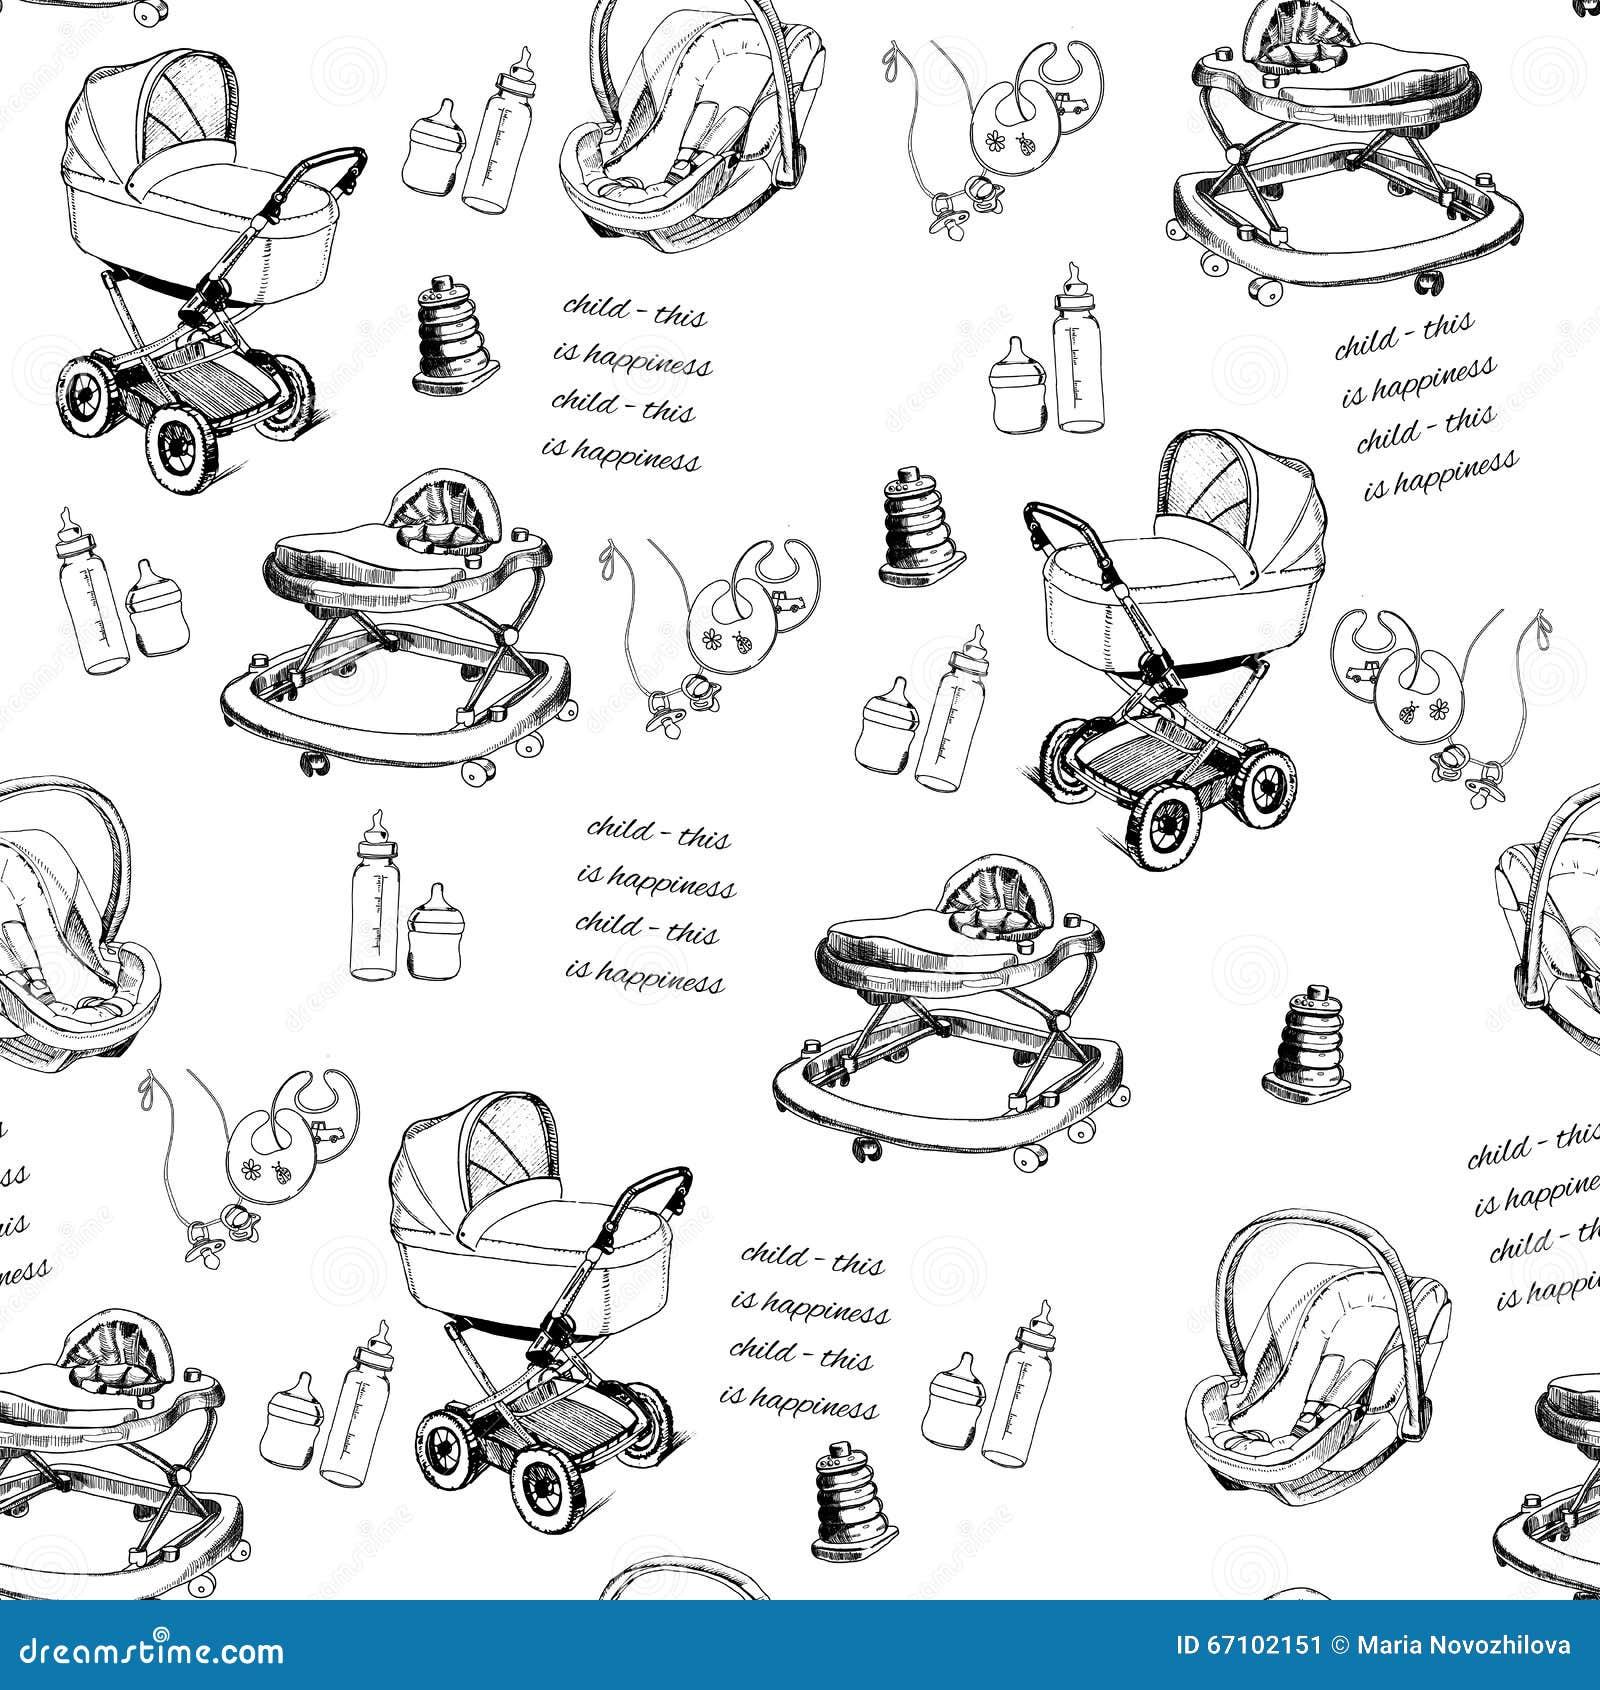 Baby Walker Stock Illustrations – 171 Baby Walker Stock ...